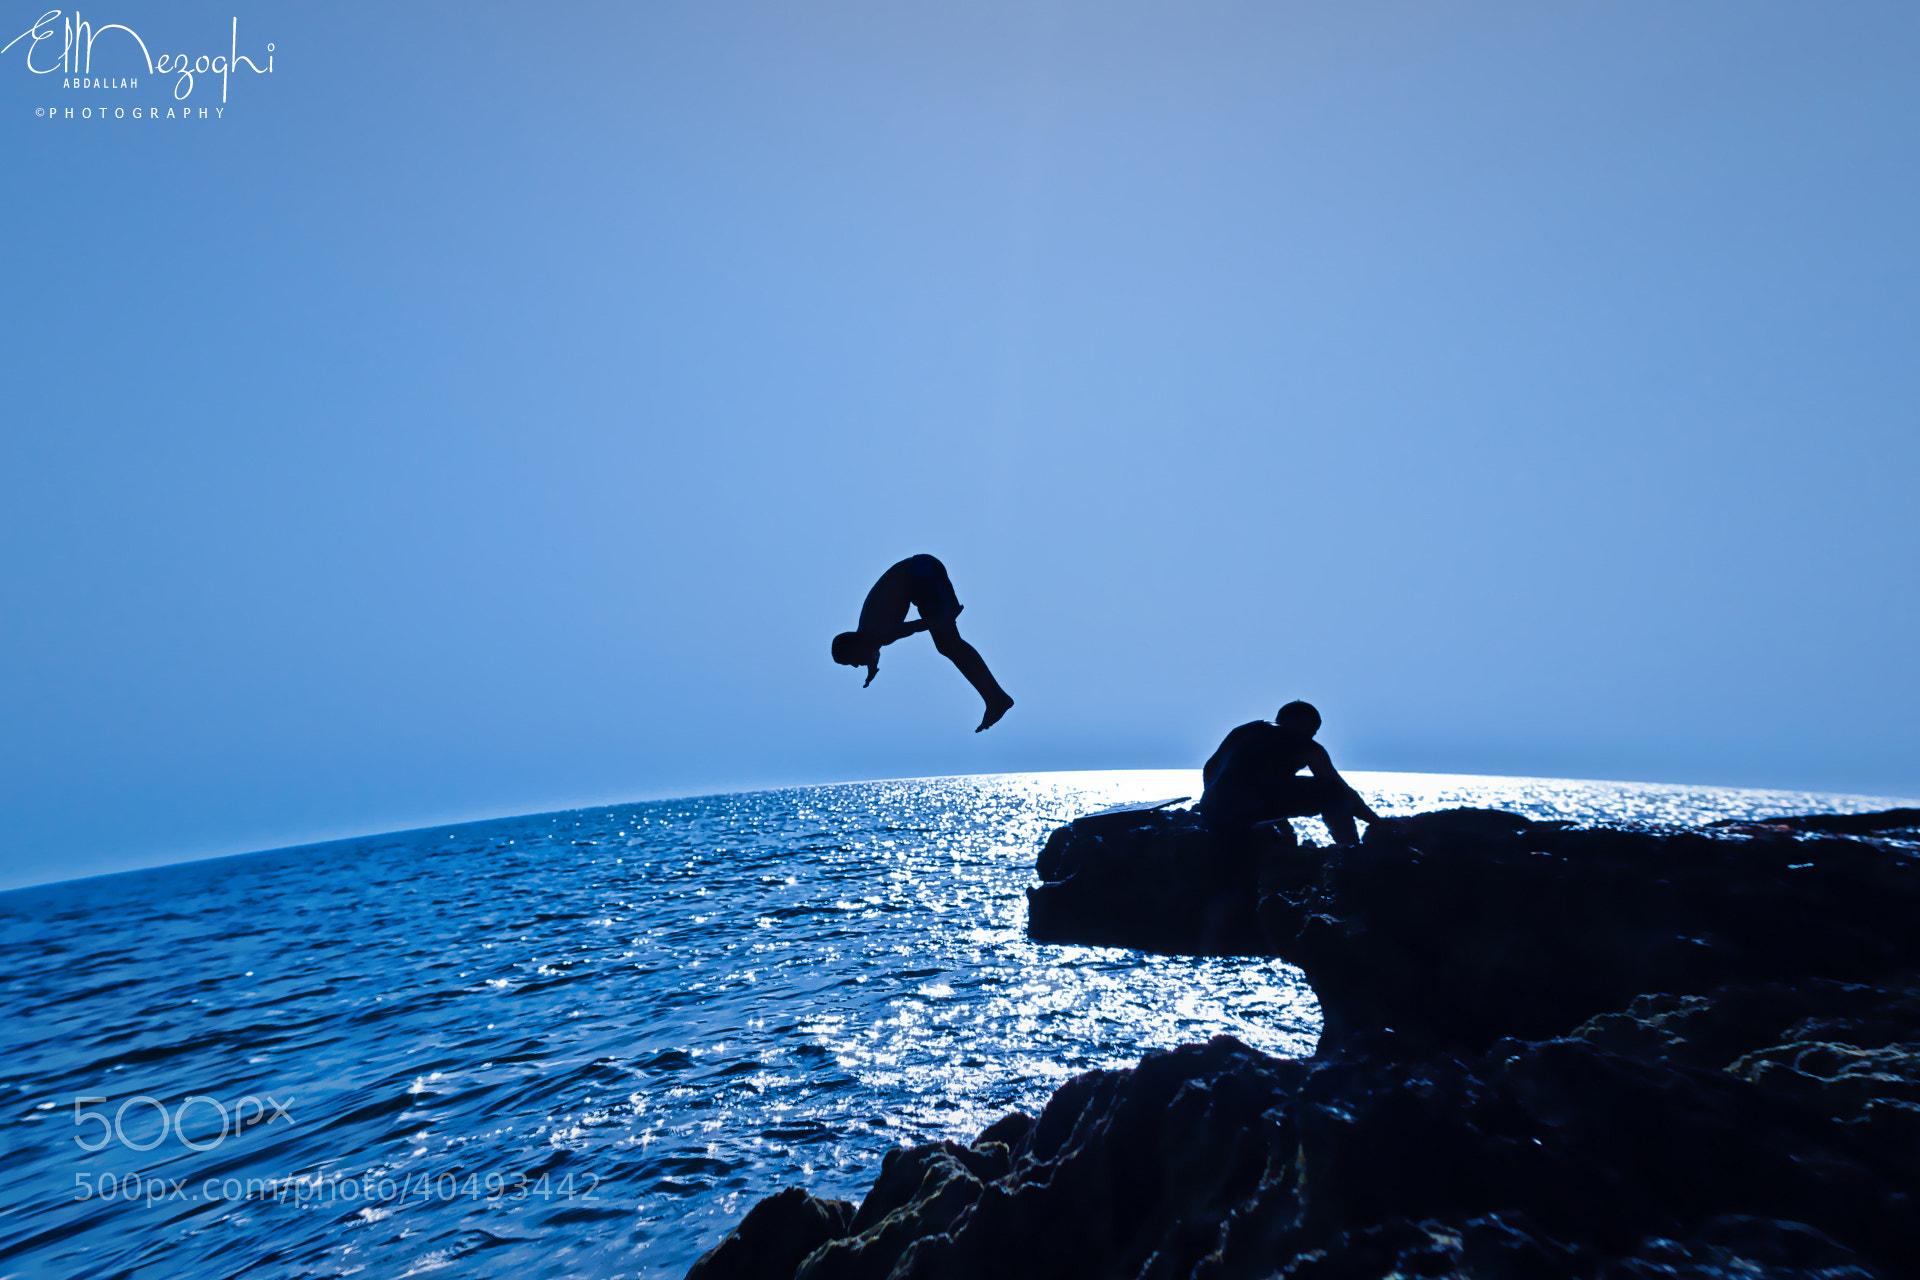 Photograph Sea Tajora by AbdallaH ElmezOghi on 500px